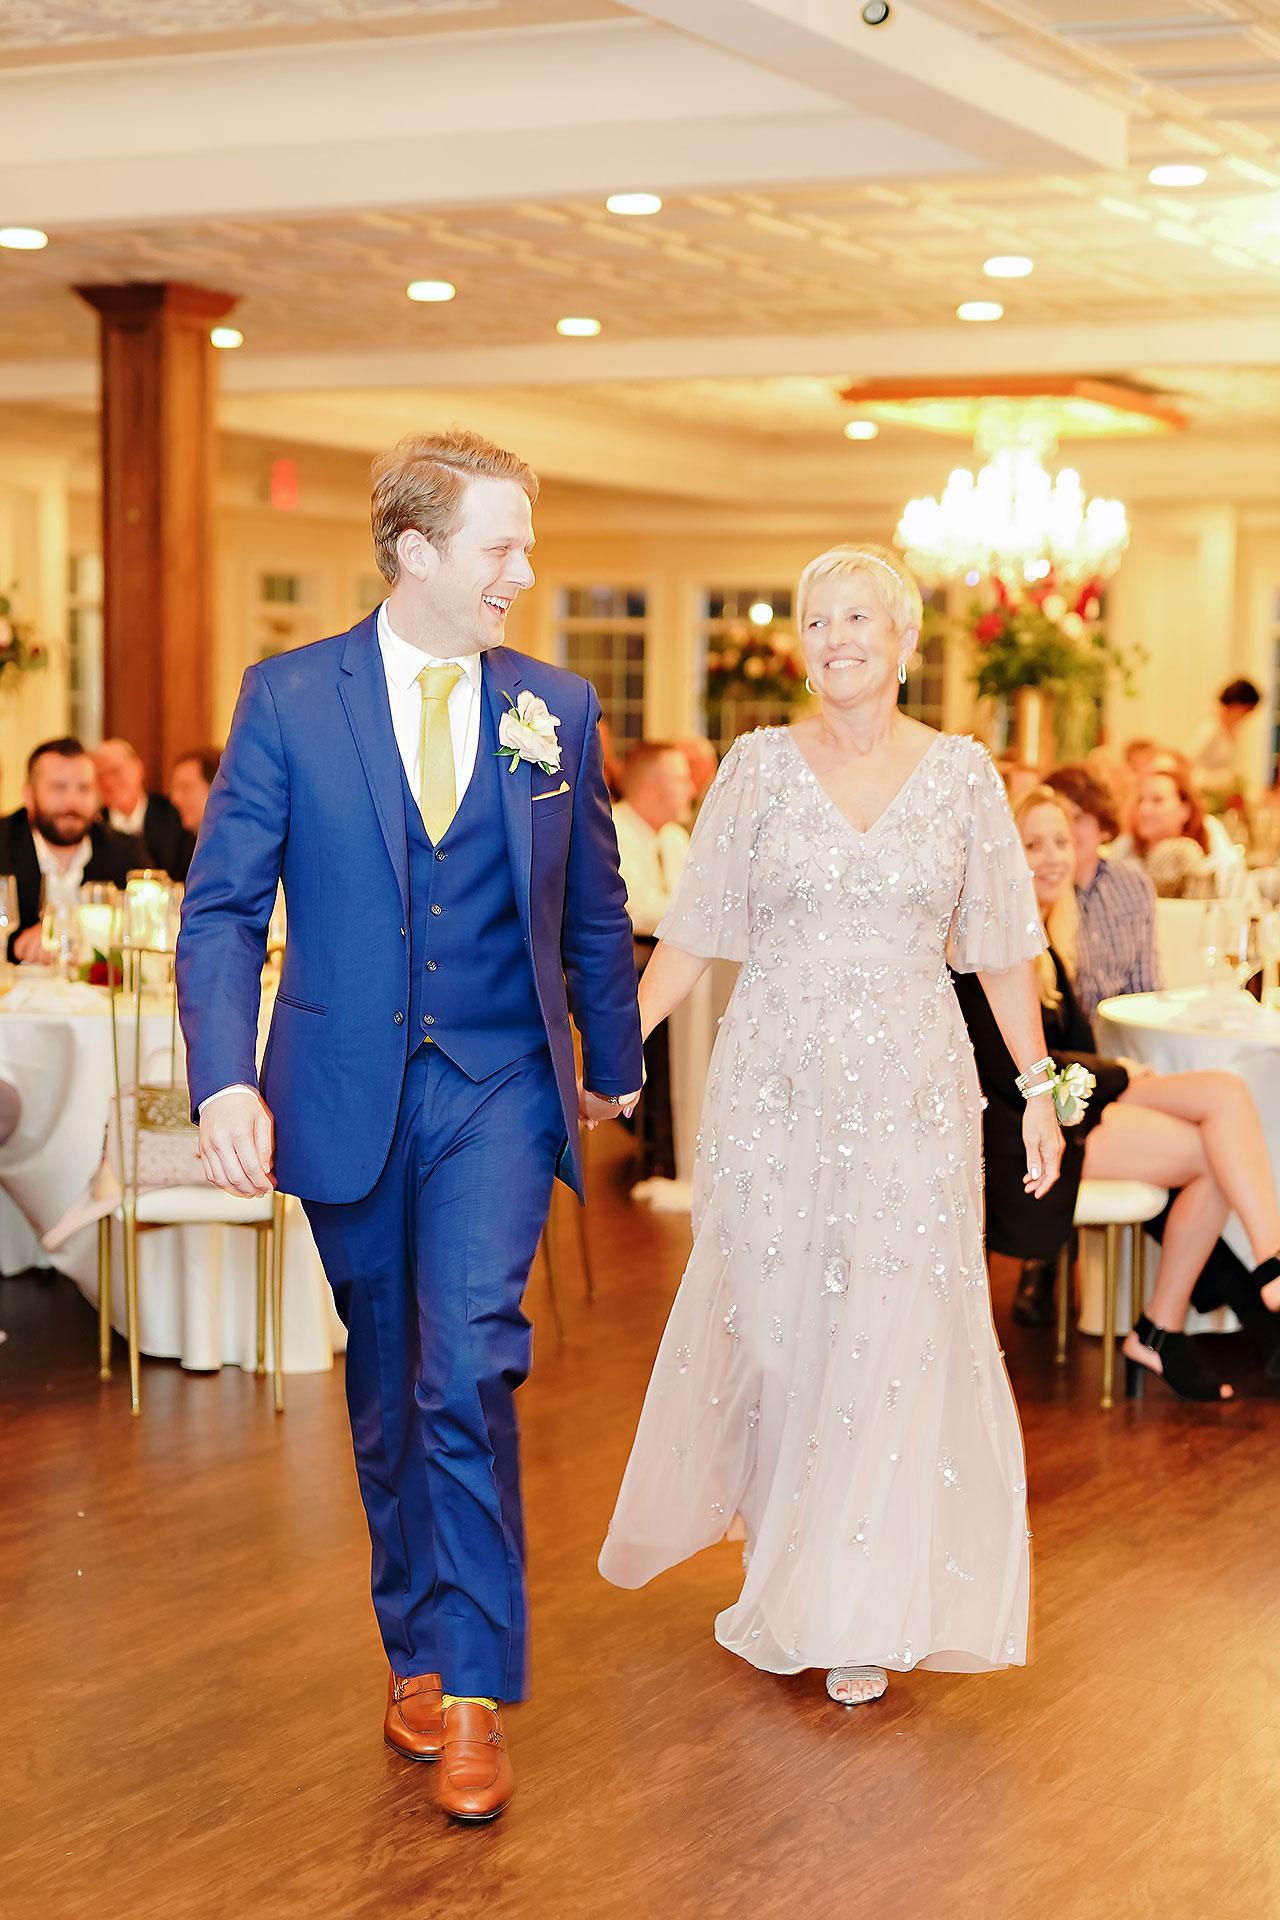 Nadia Parker Black Iris Estate Carmel Indiana Wedding May 2021 300